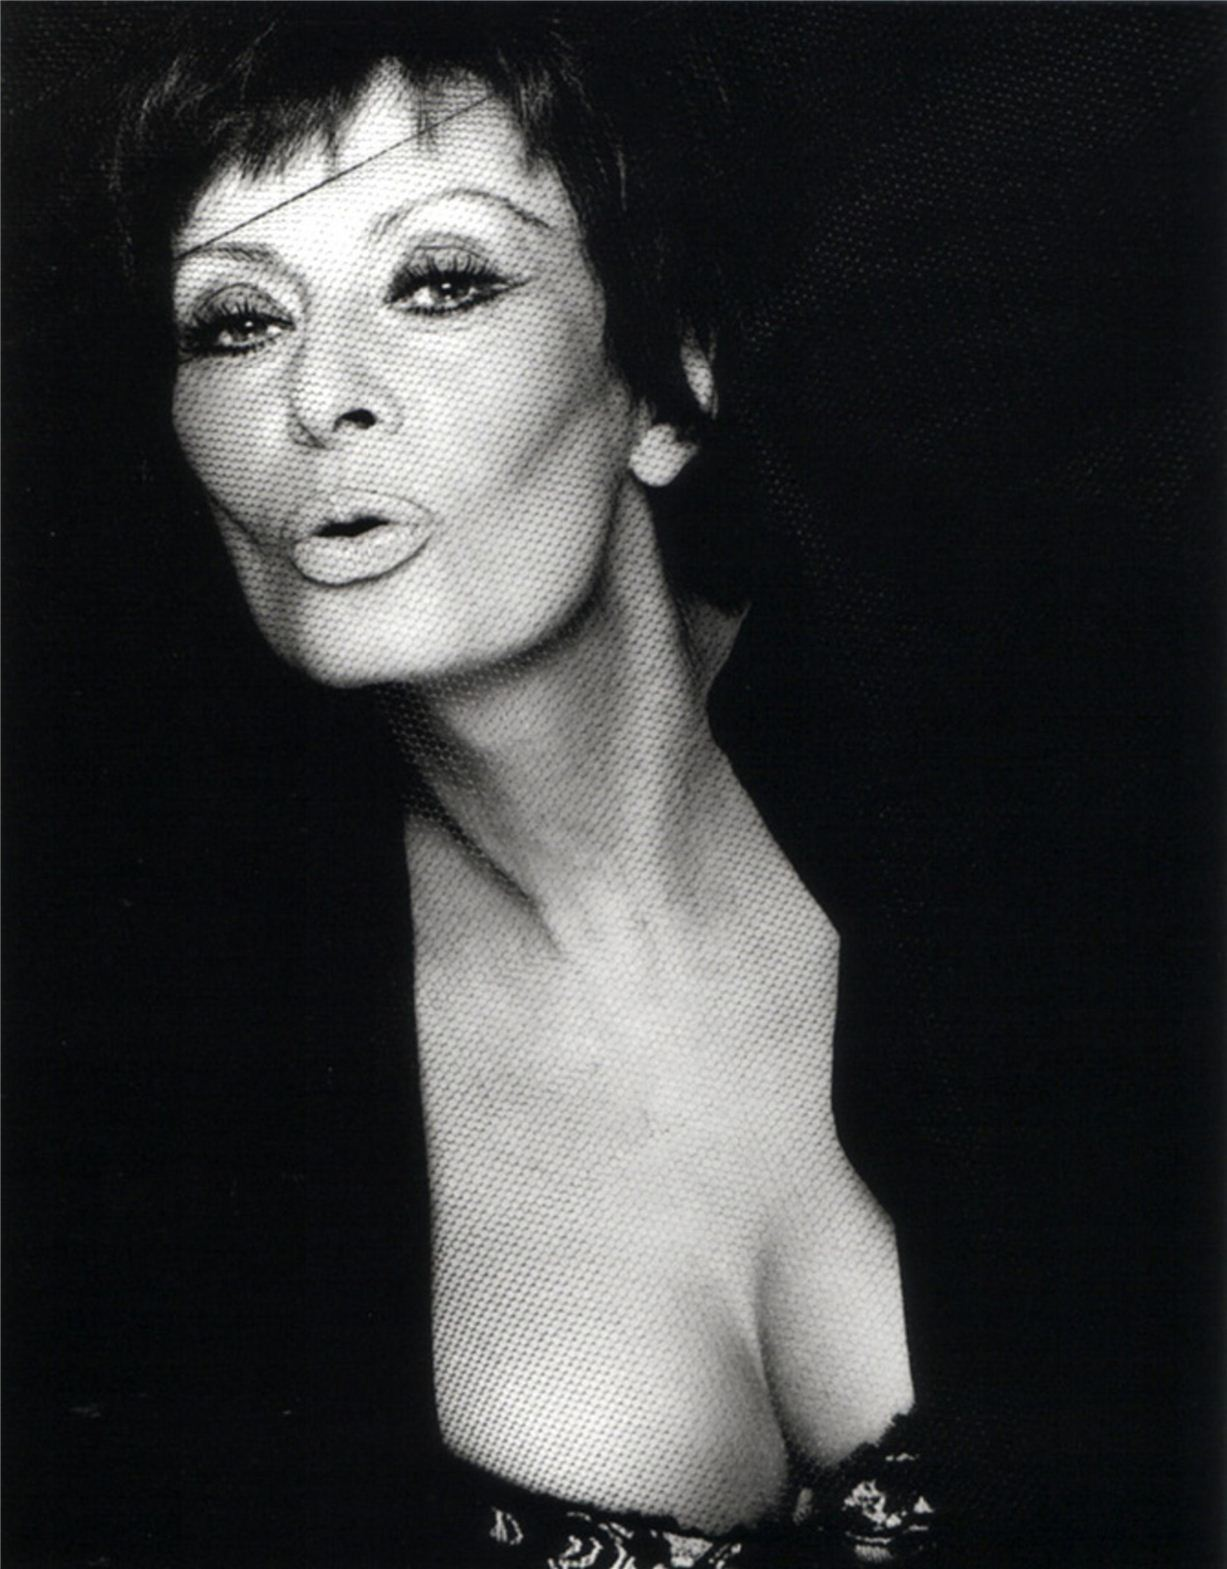 Sophia Loren / Софи Лорен - портрет фотографа Грега Гормана / Greg Gorman